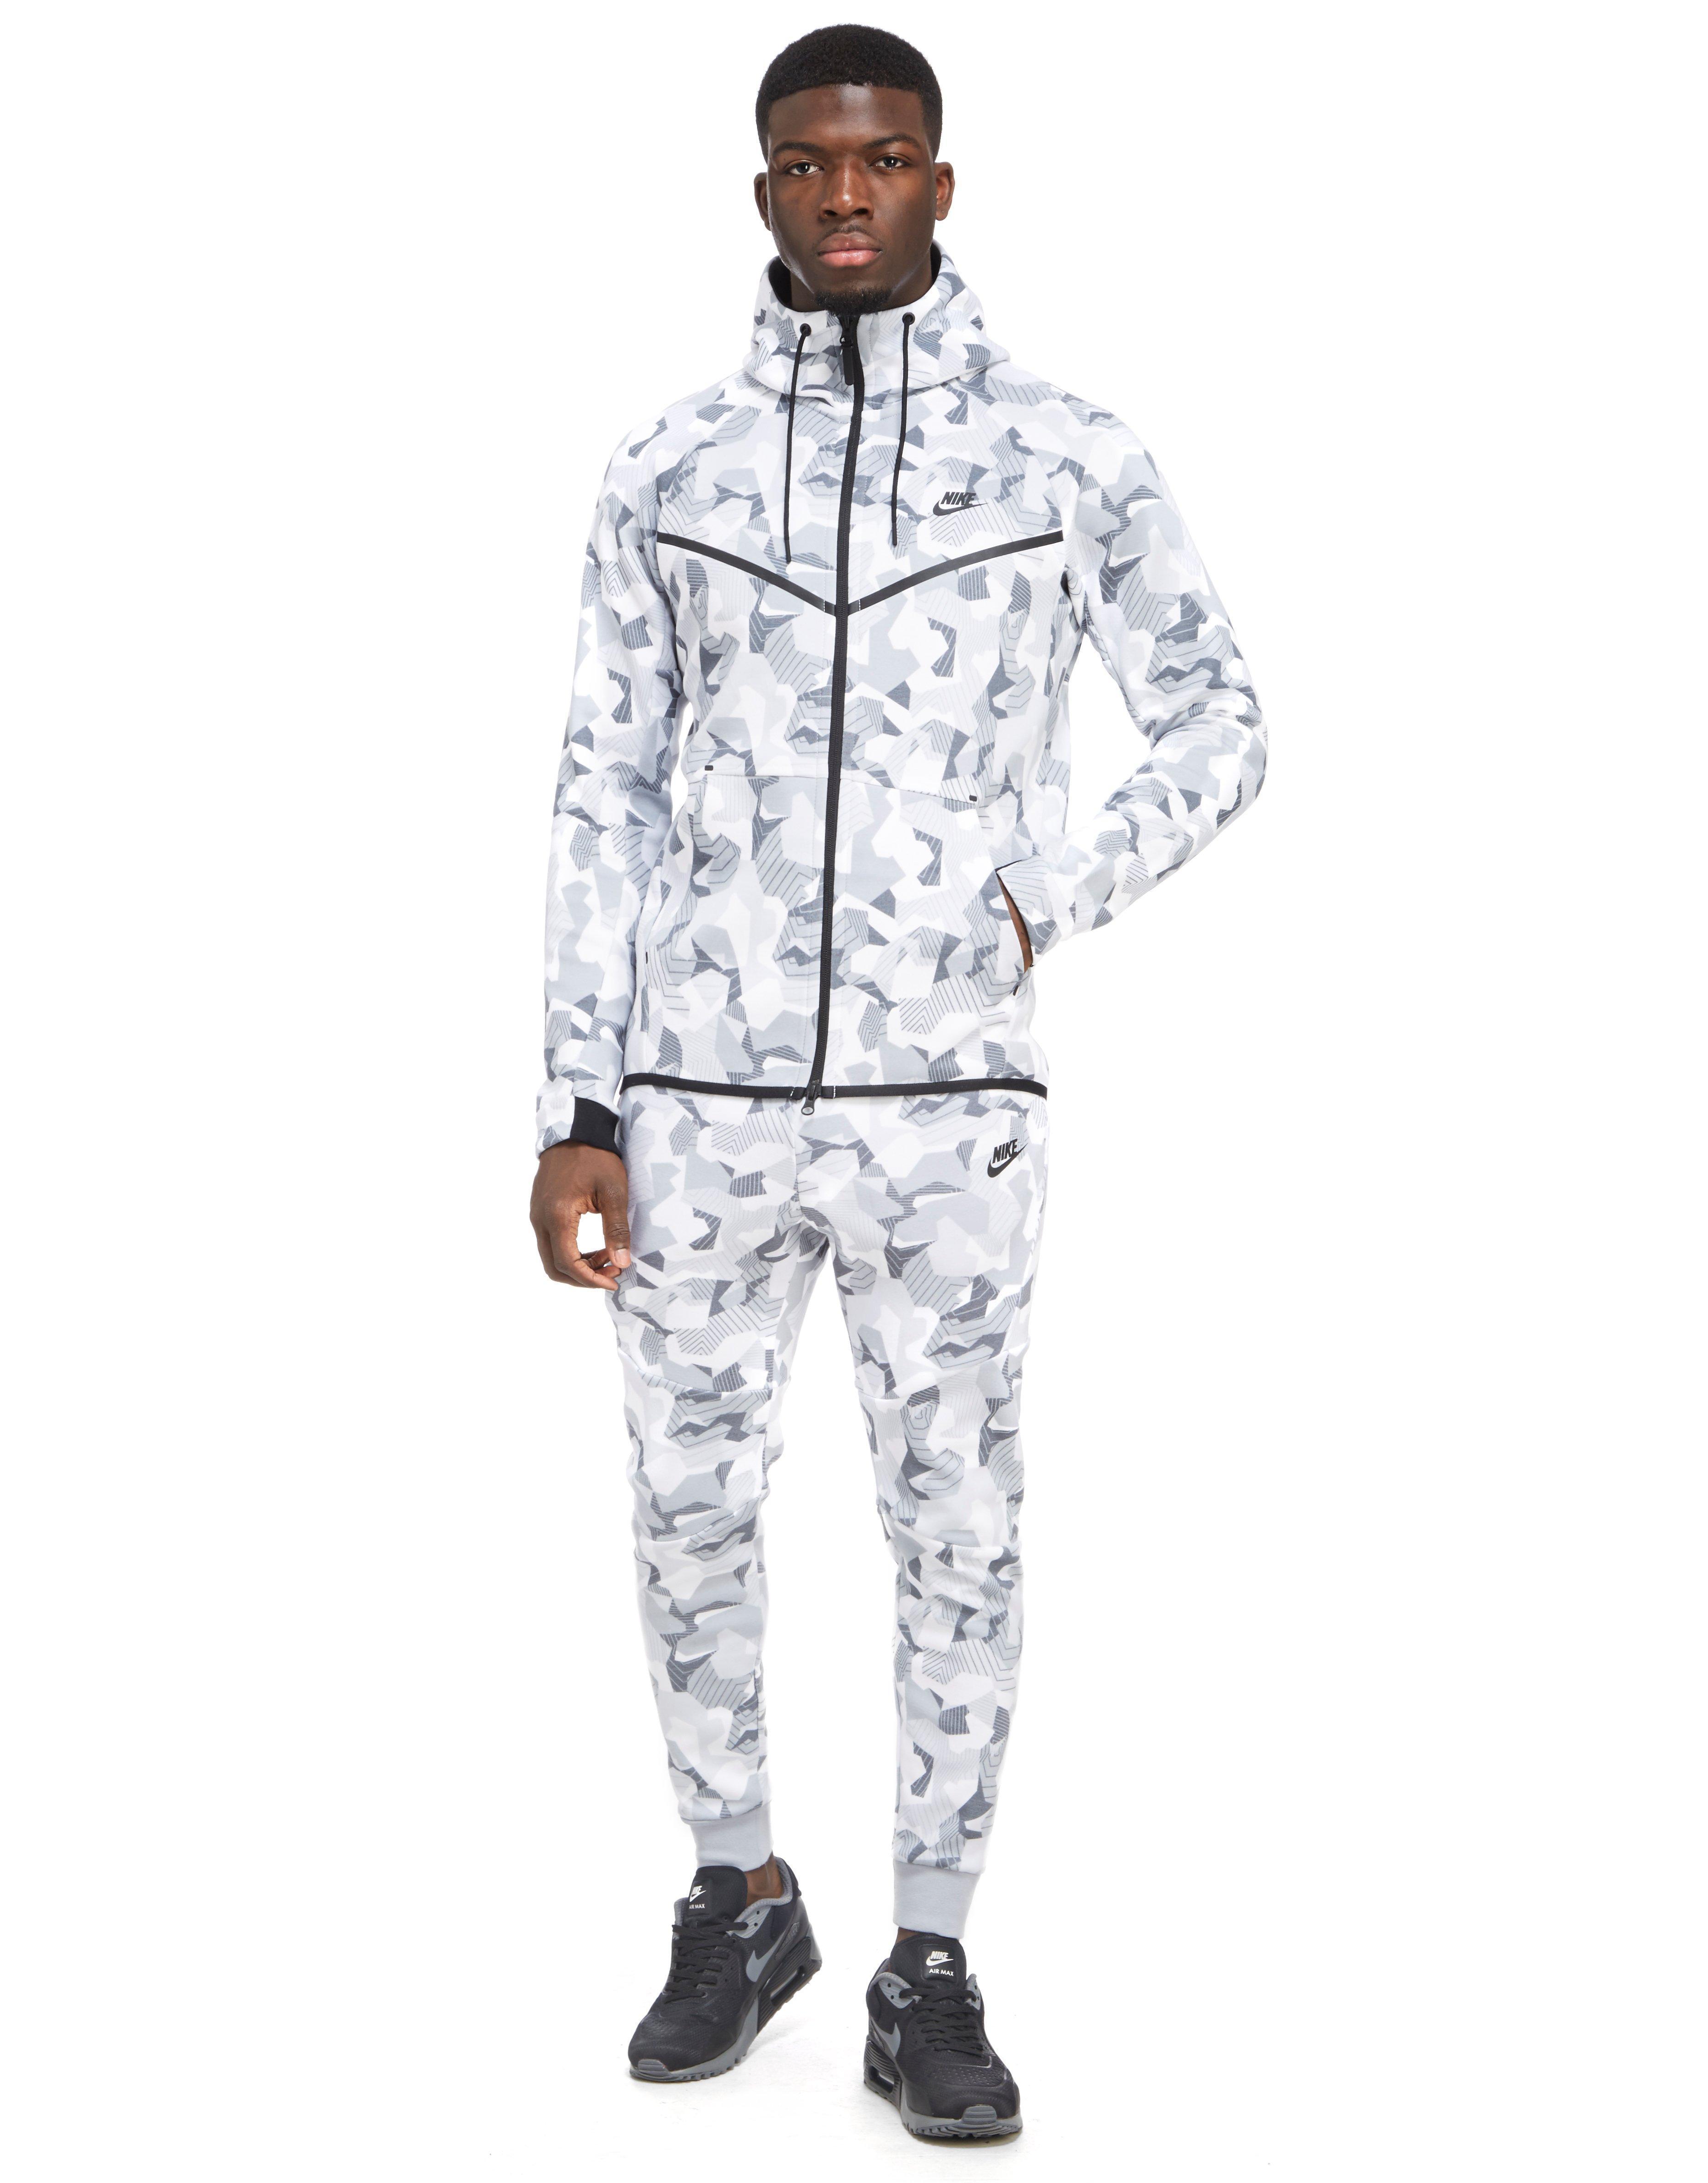 Lyst - Nike Tech Fleece Camouflage Pants in White for Men ac74c3f35d39